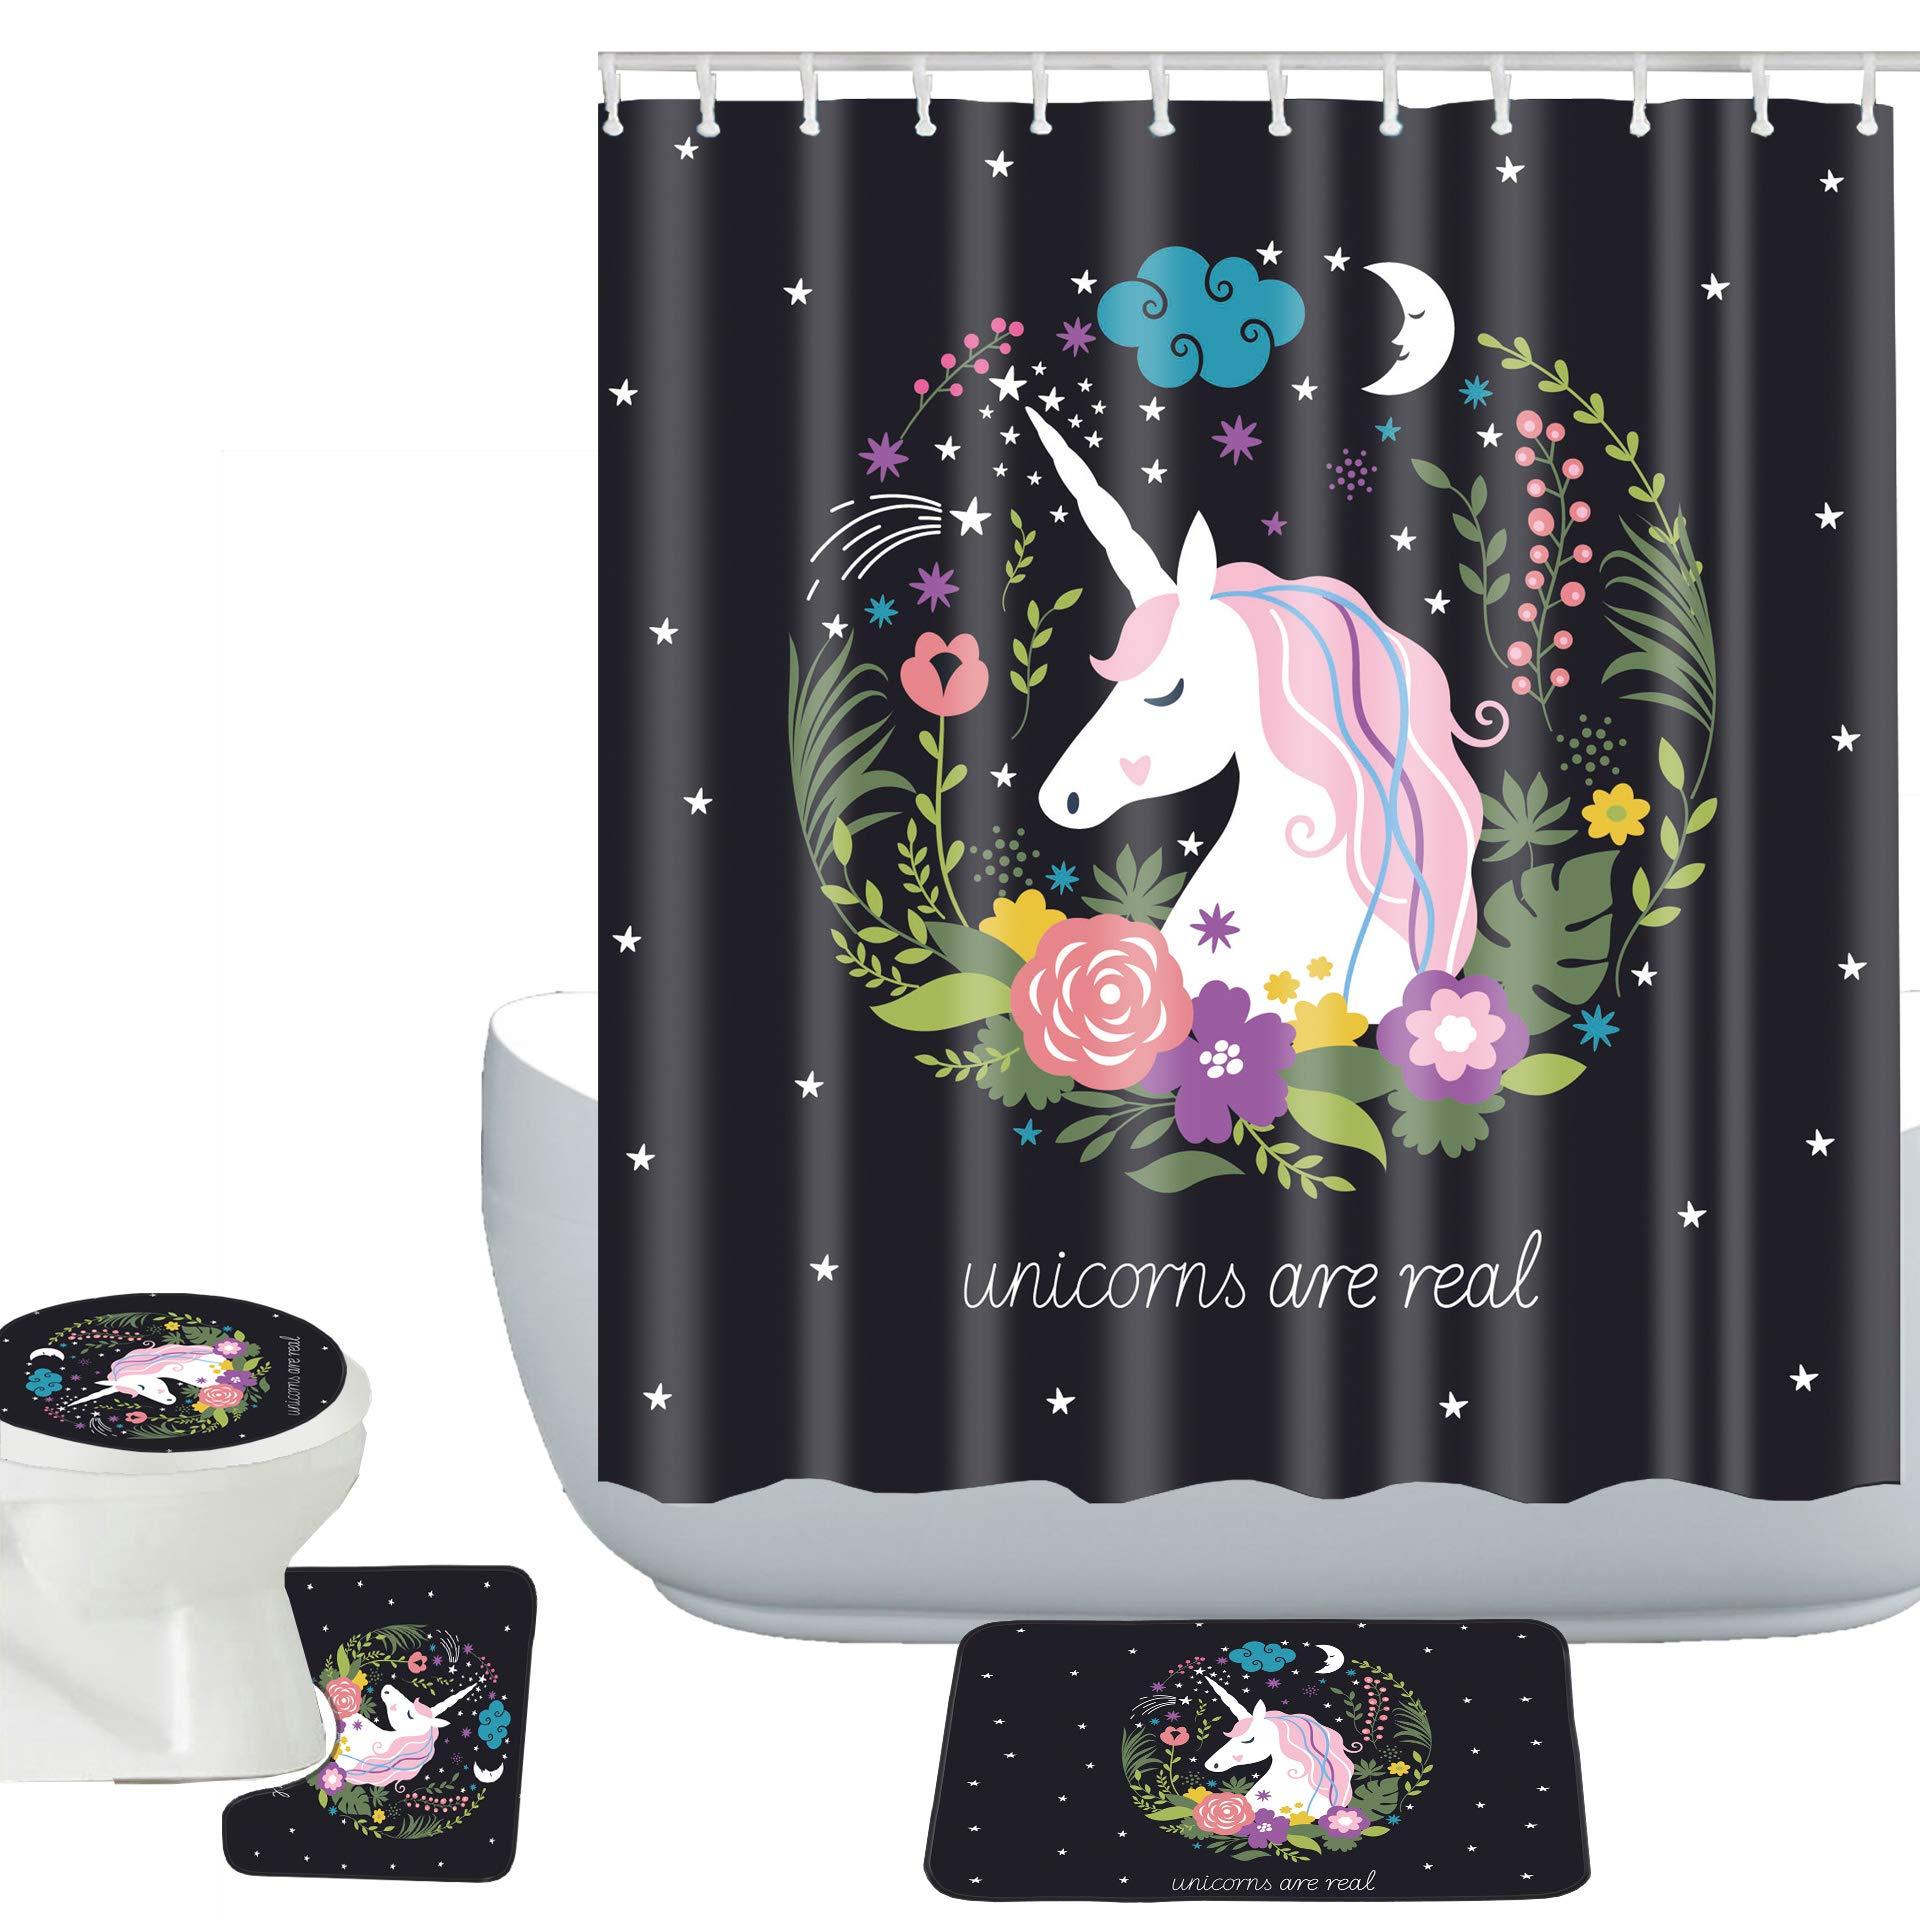 Amagical Unicorns are Real Decor Colorful Flowers with Unicorn 16 Piece Bathroom Mat Set Shower Curtain Set Bath Mat Contour Mat Toilet Cover Waterproof Shower Curtain with 12 Hooks Black (16)